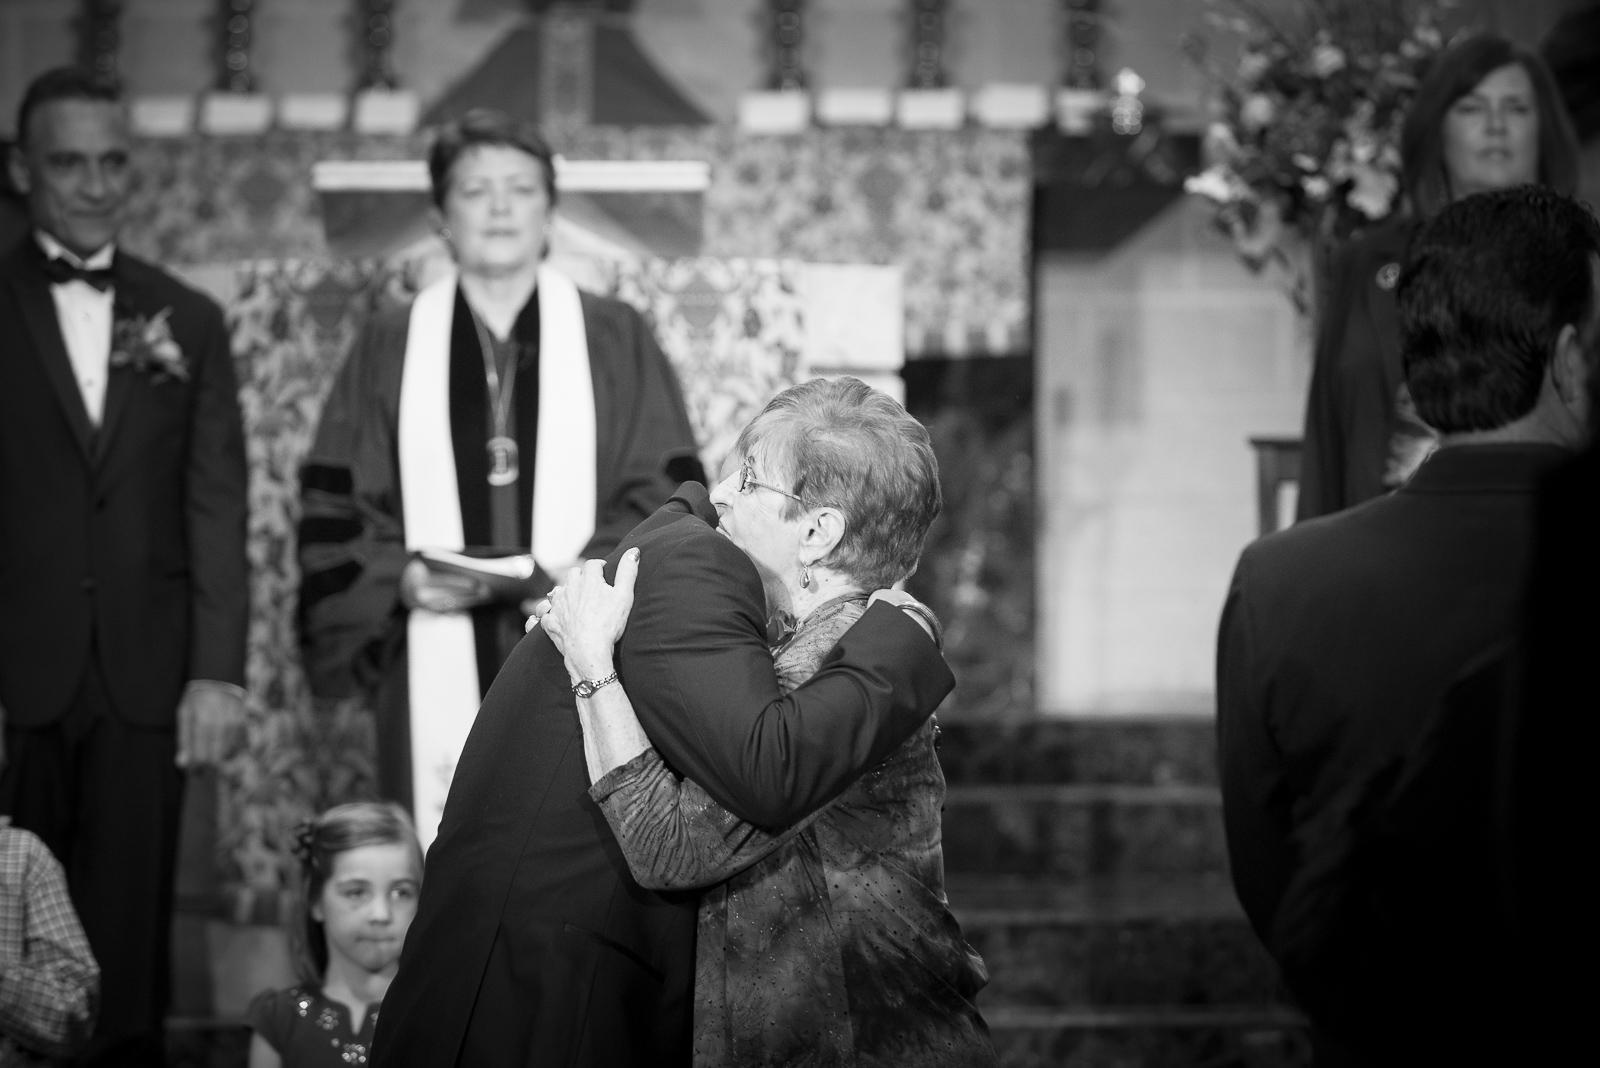 Michael-Napier-Weddings-Ludwig-Guilbeau Wedding-20 (12).jpg